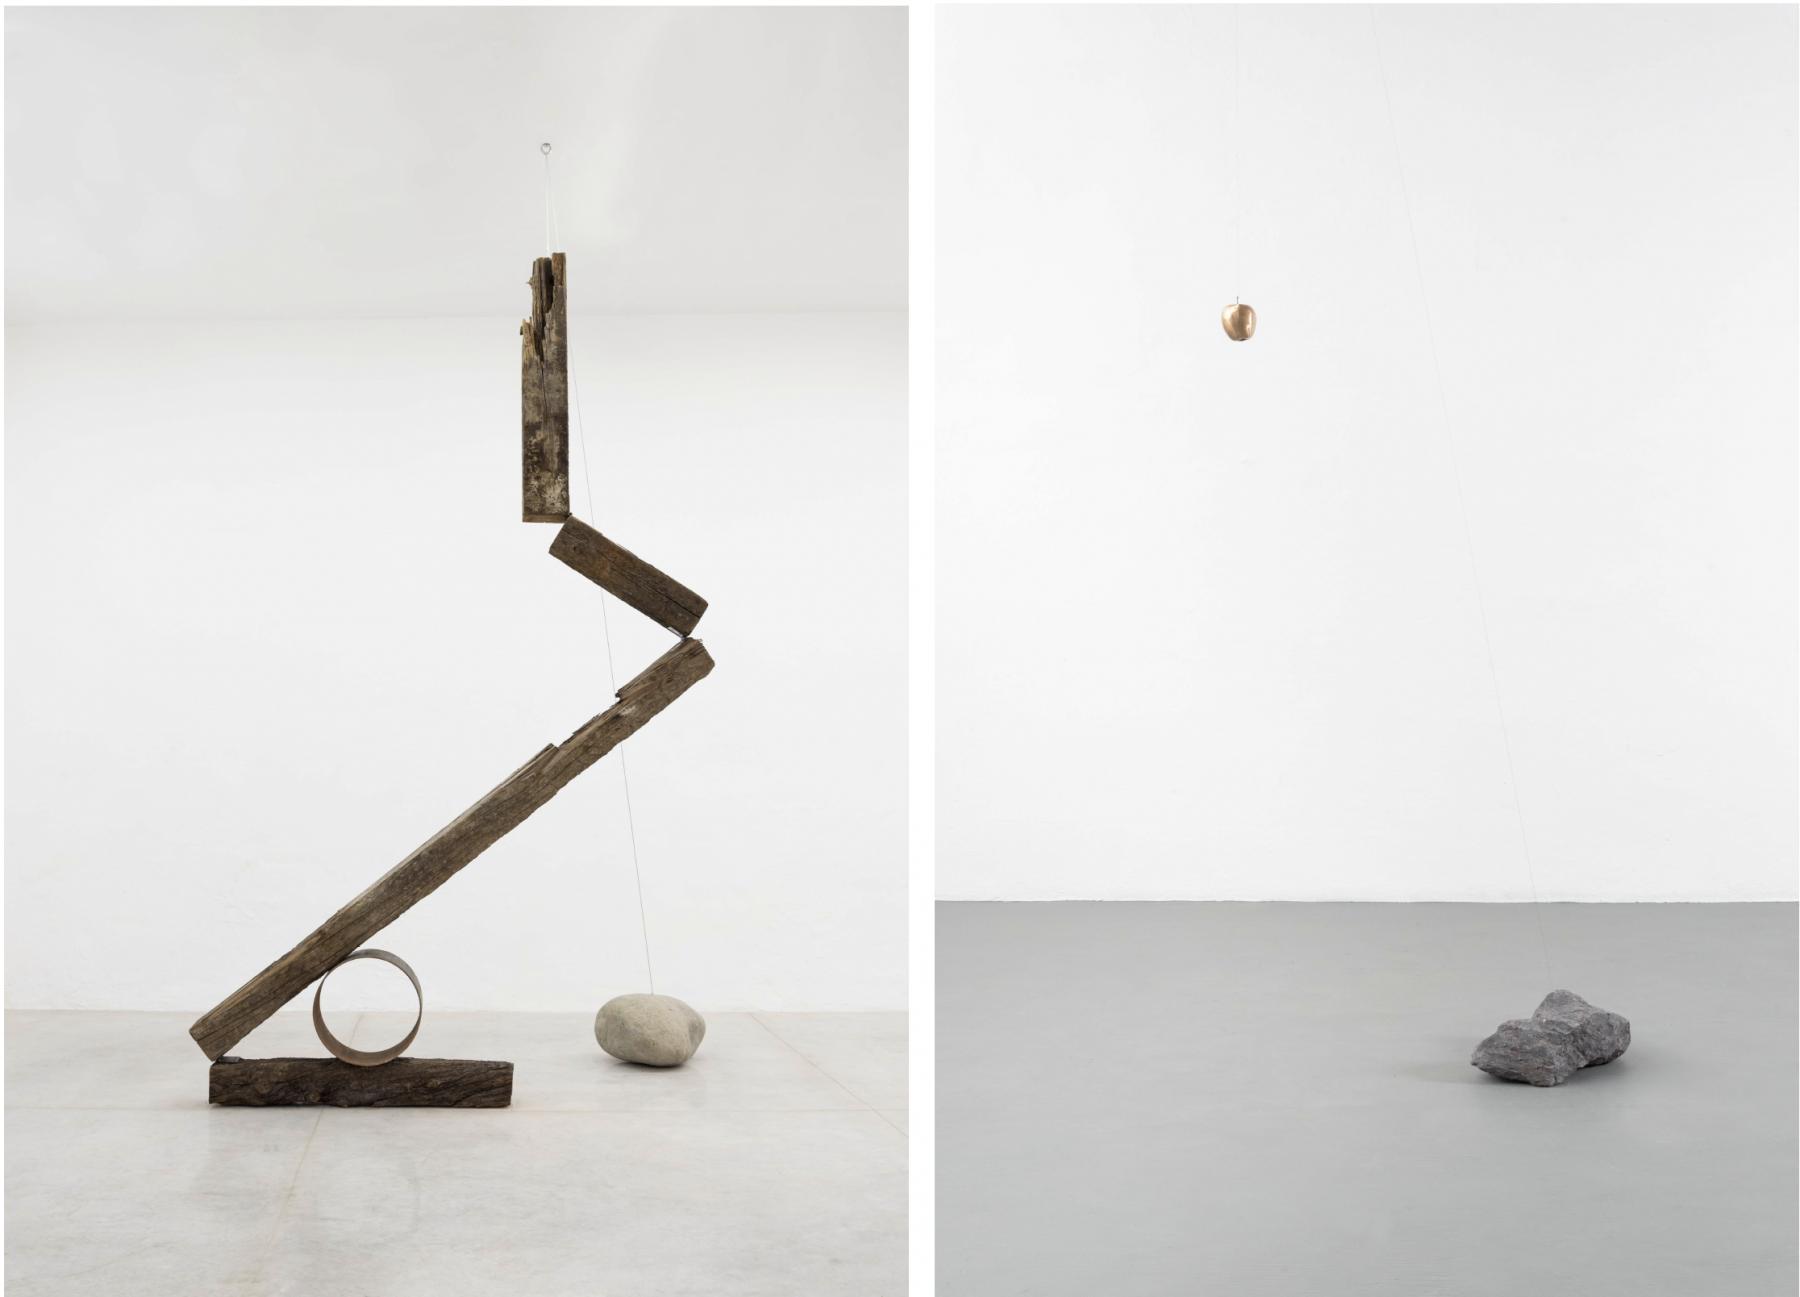 sculpture 23 & 14